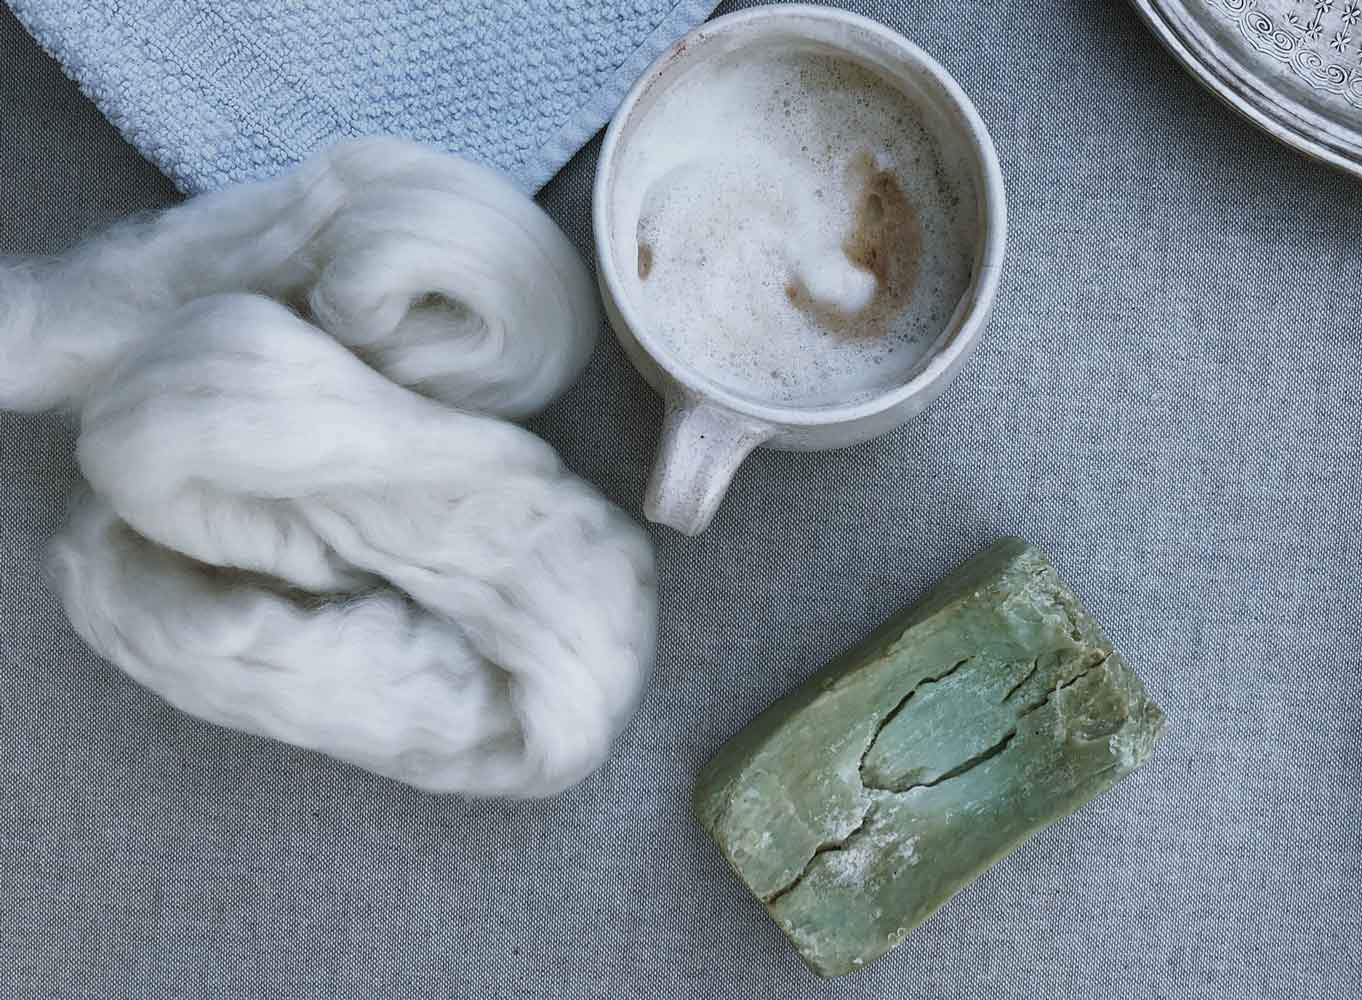 Filzen Filzwolle Kaffee Seife Naßfilzen - Grundkenntnisse im Naßfilzen mit Kindern